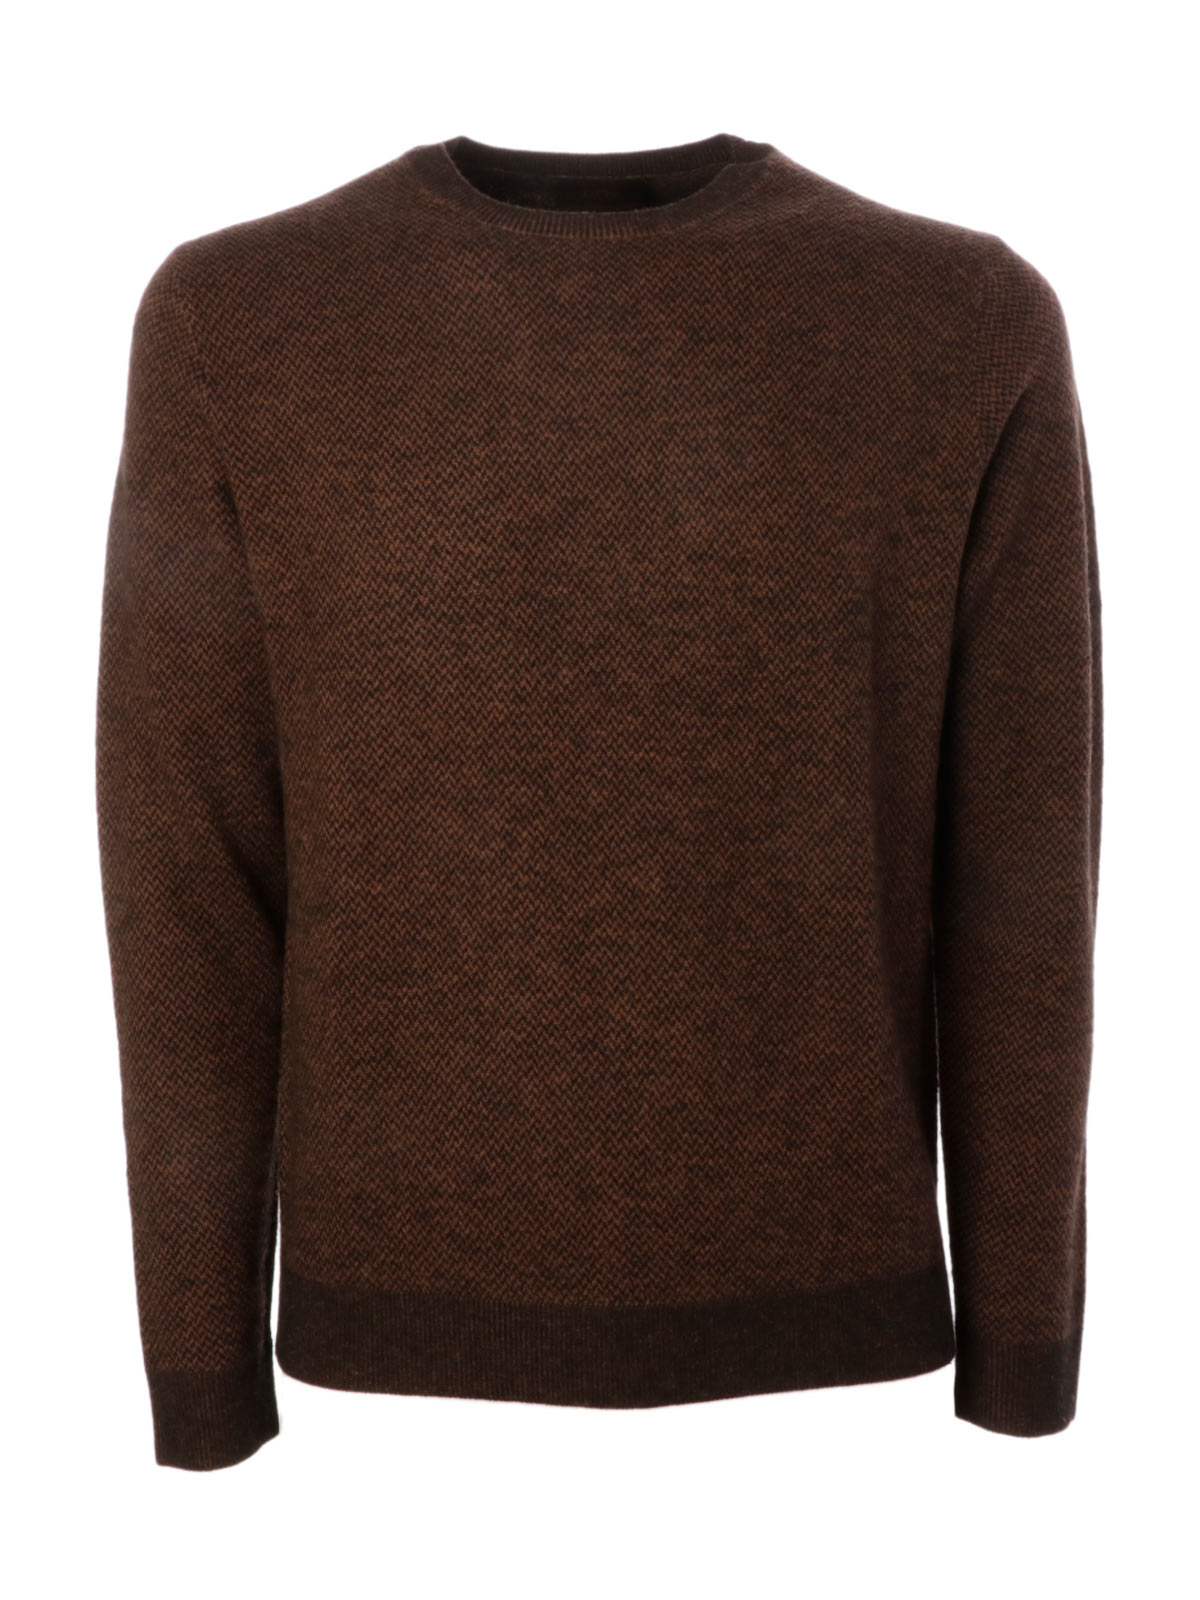 Picture of ALTEA | Men's Herringbone Sweater